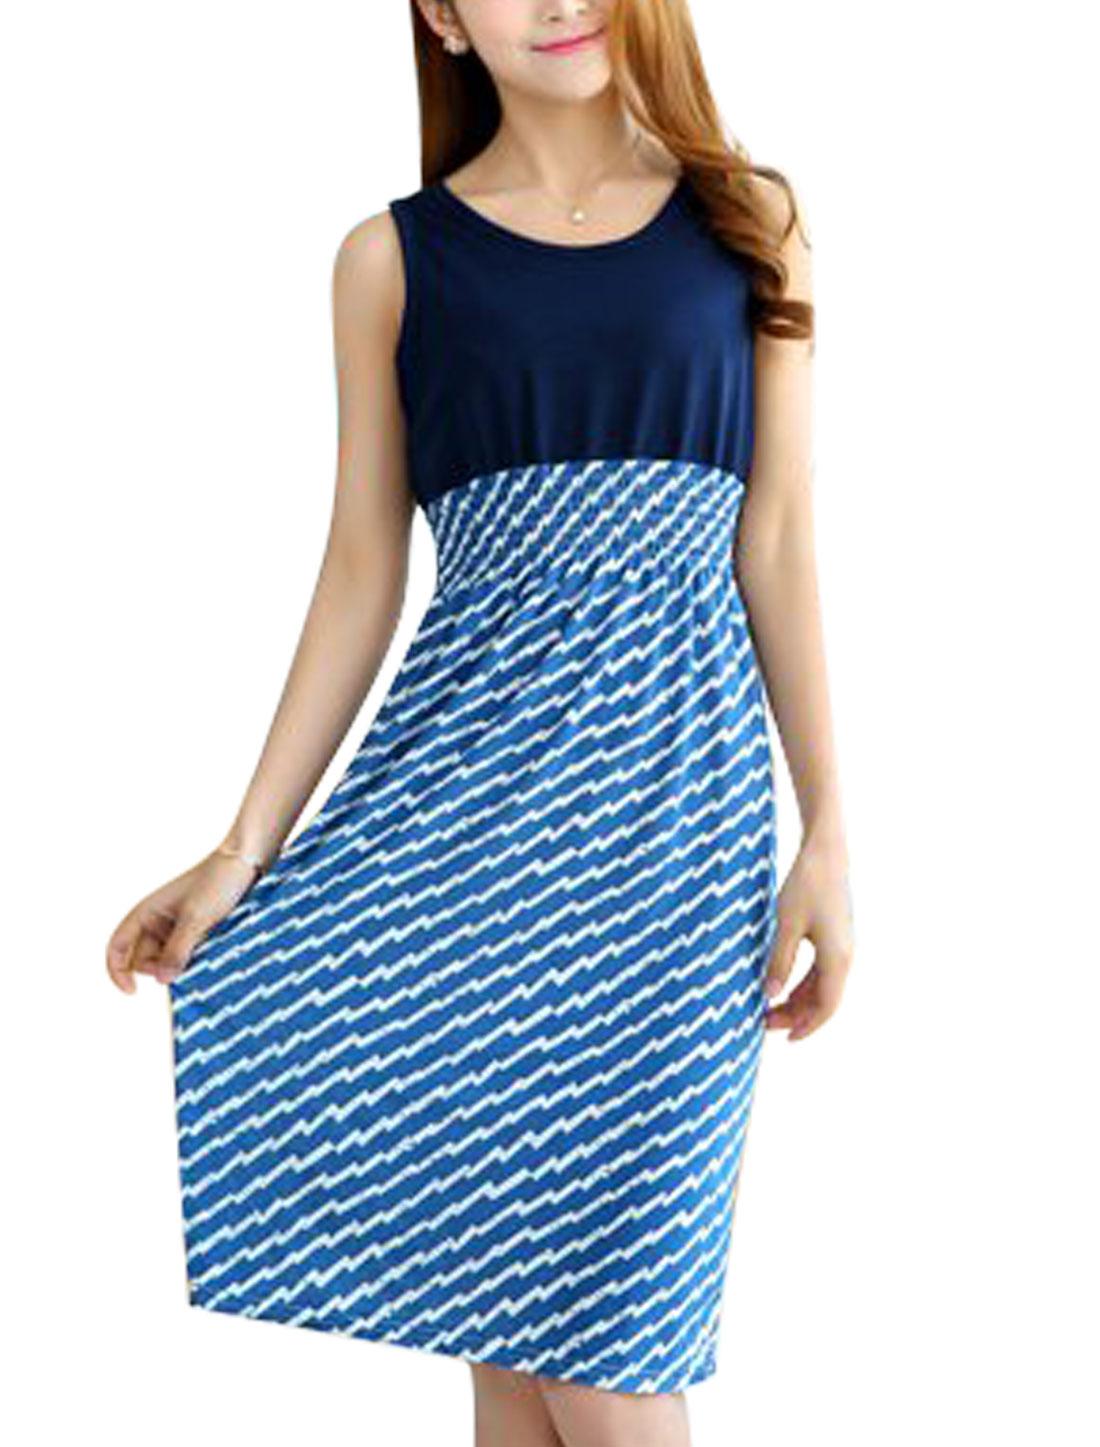 Woman Sawtooth Pattern Round Neck Sleeveless Elastic Waist Dress Blue White XS